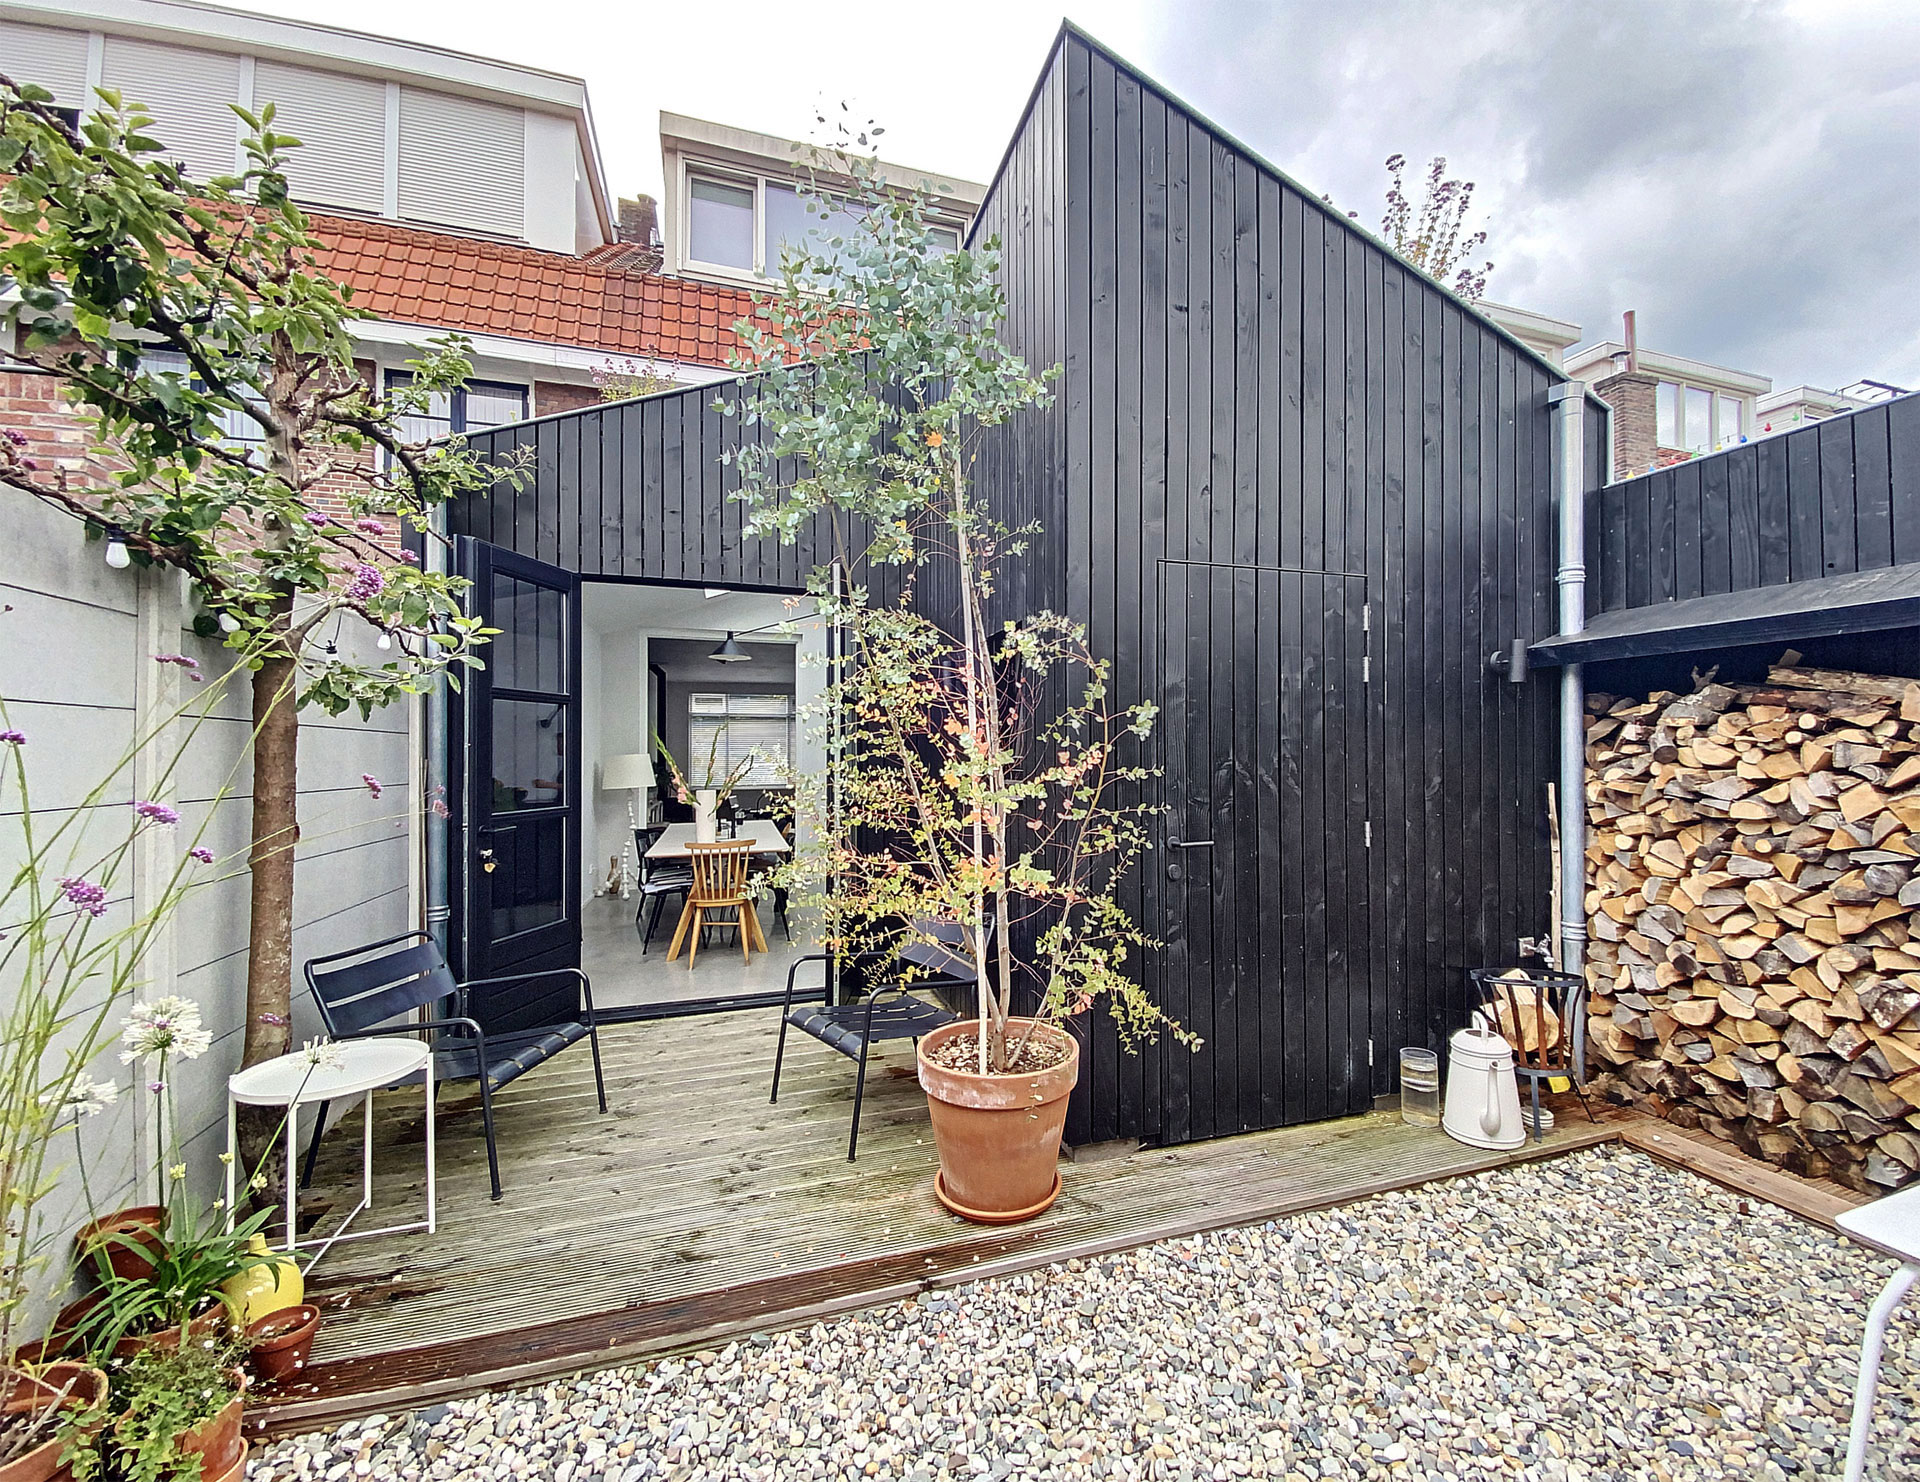 Aanbouw-houten-gevelbekleding-zwart-architect-Breda-2